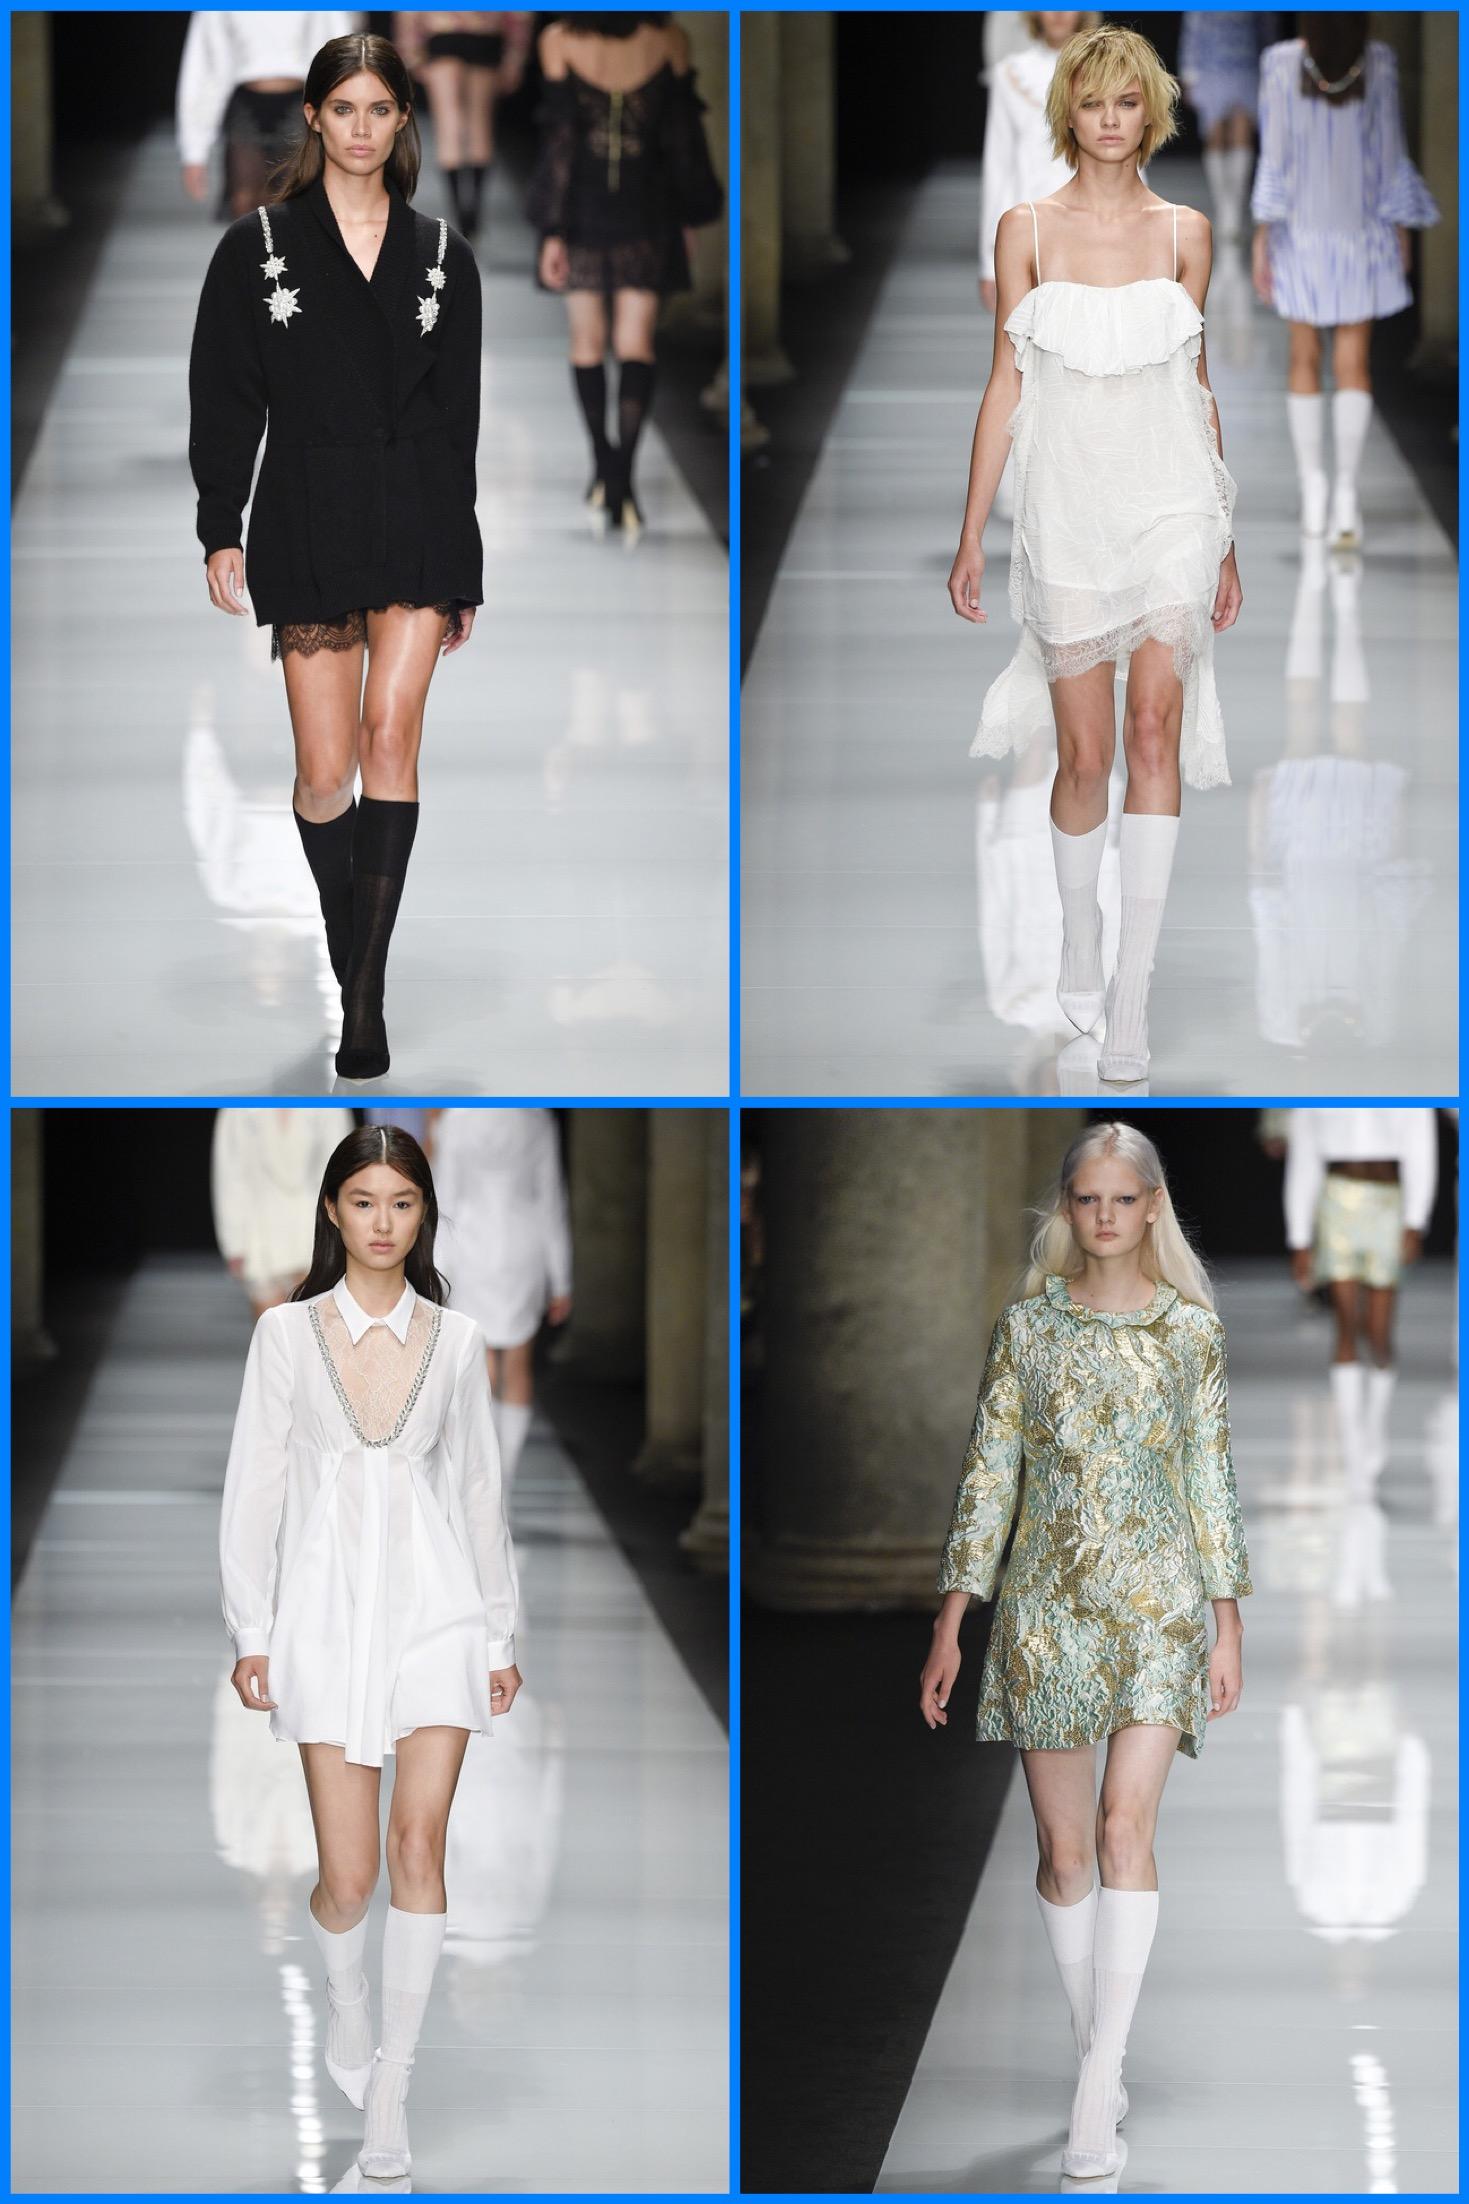 milano-fashion-week-pret-a-porter-spring-summer-2017-style-francesco-scognamiglio